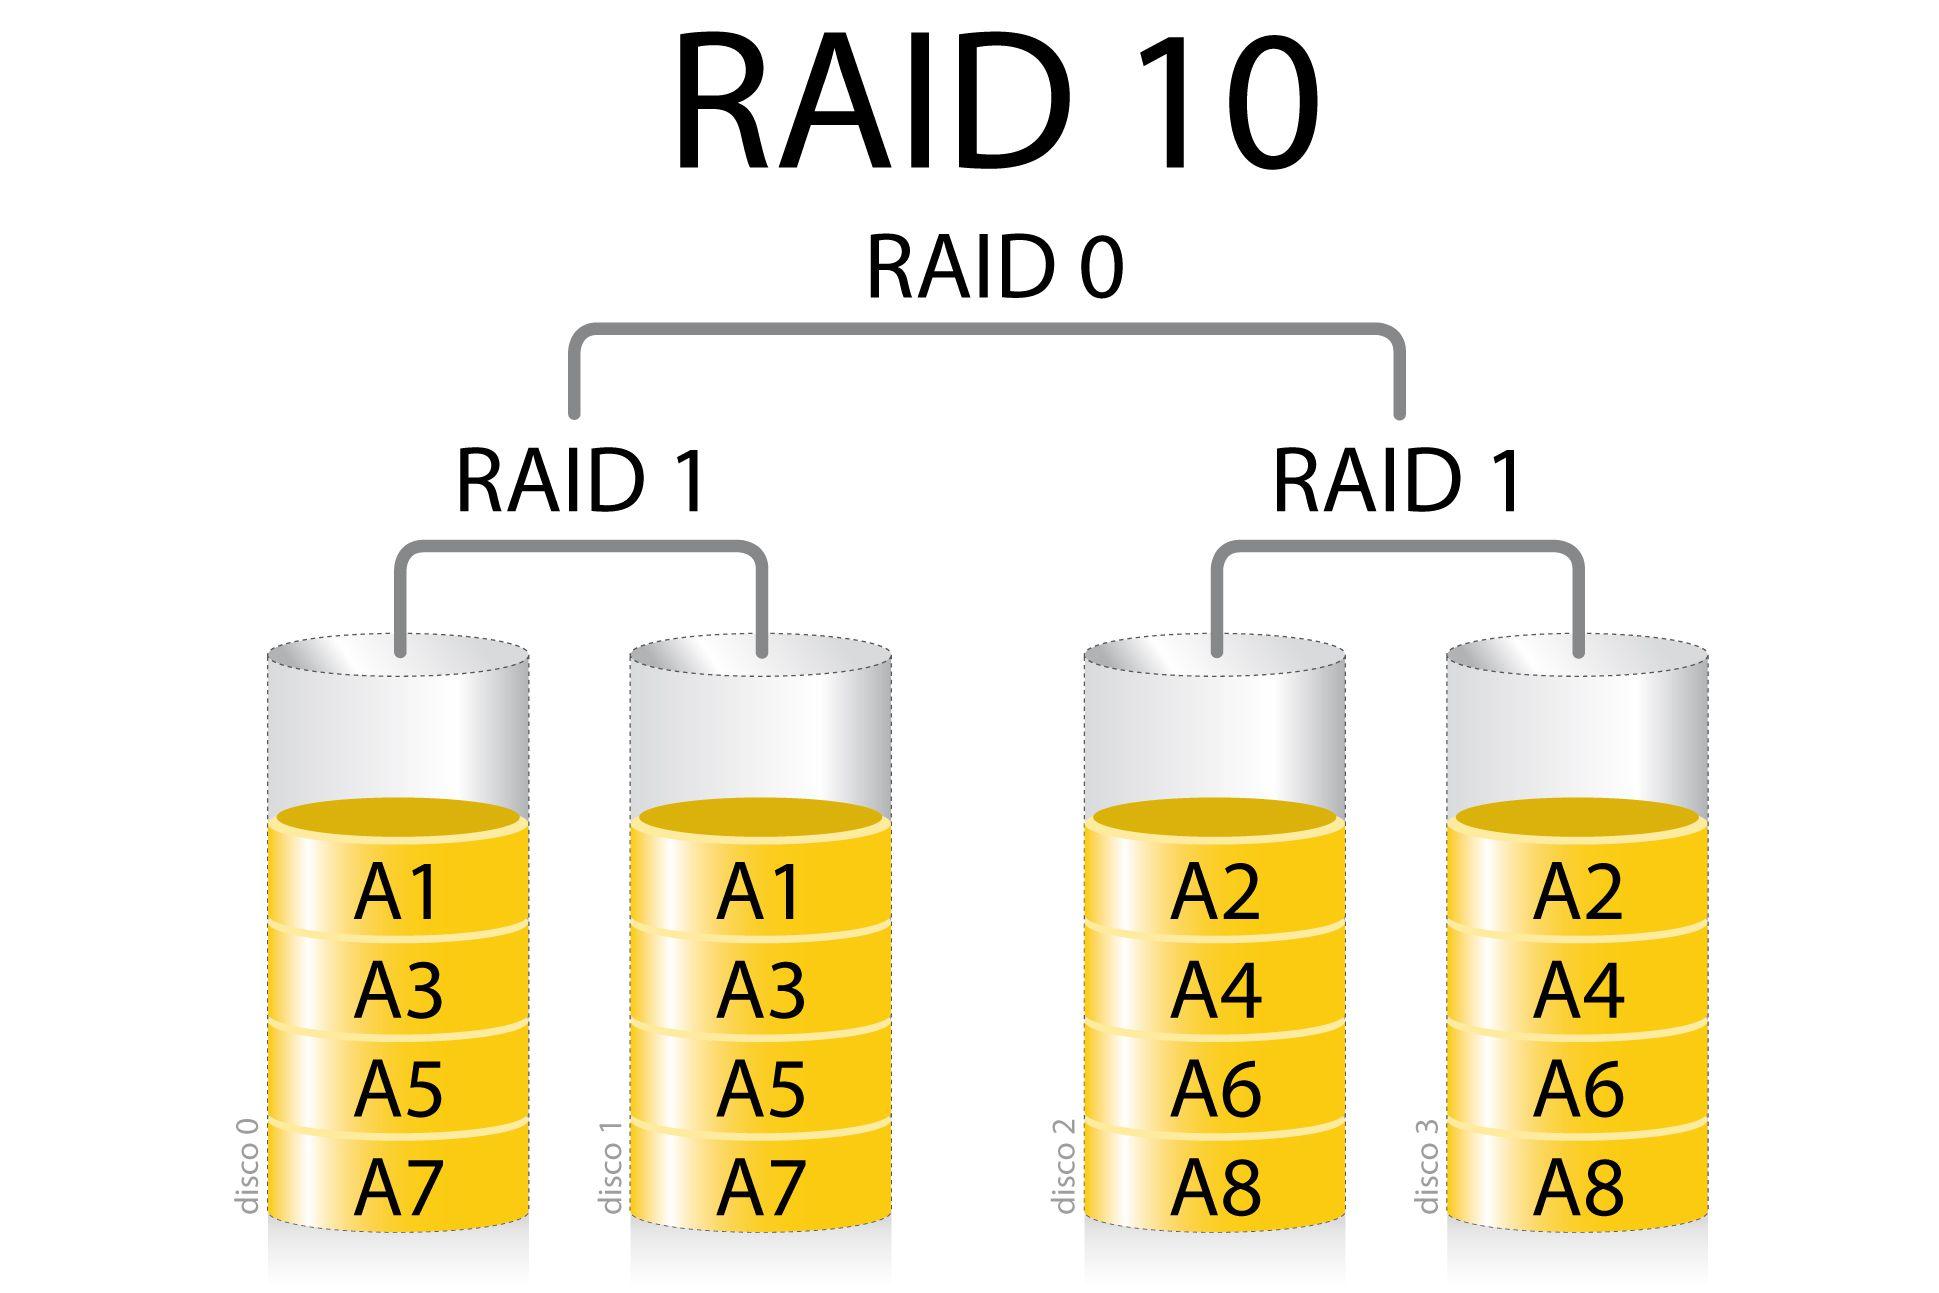 RAID 10 infographic